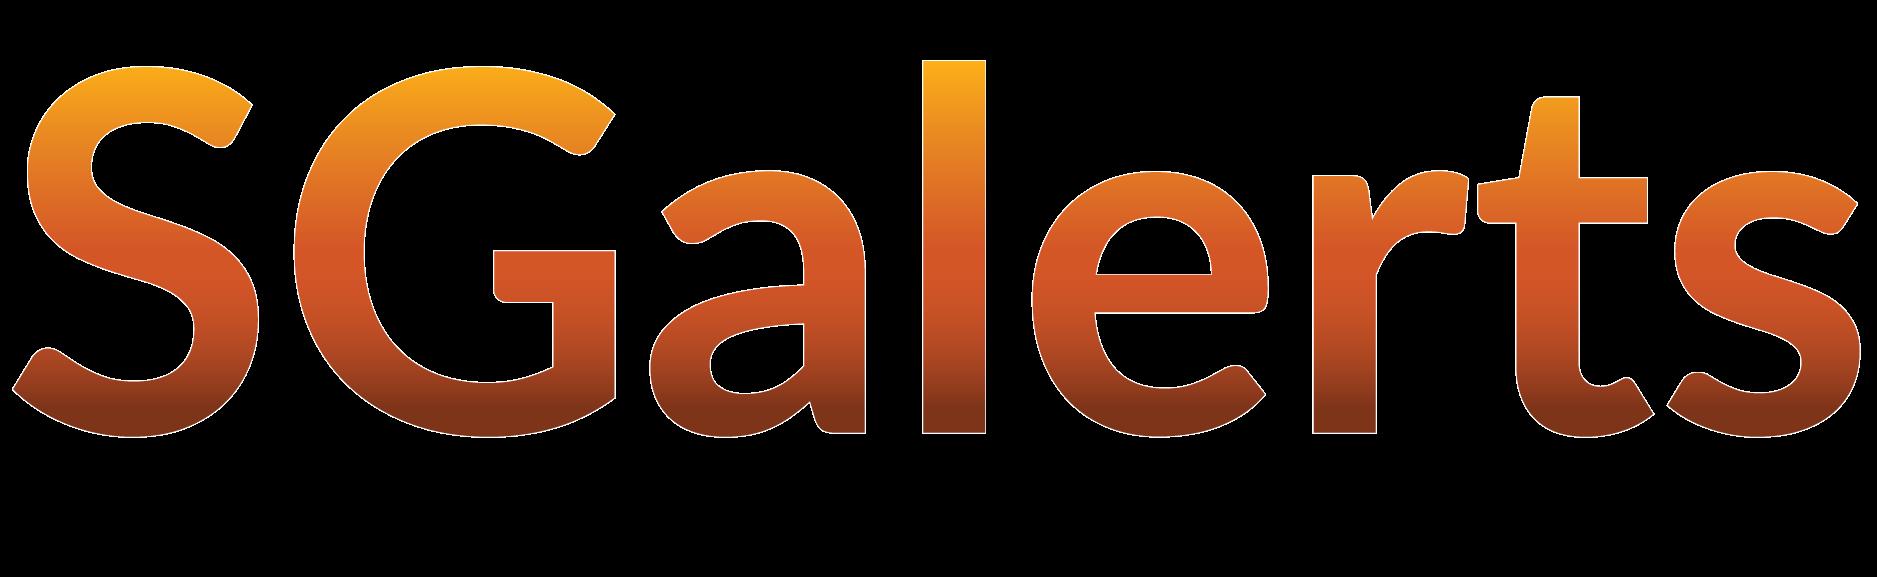 SGalerts logo